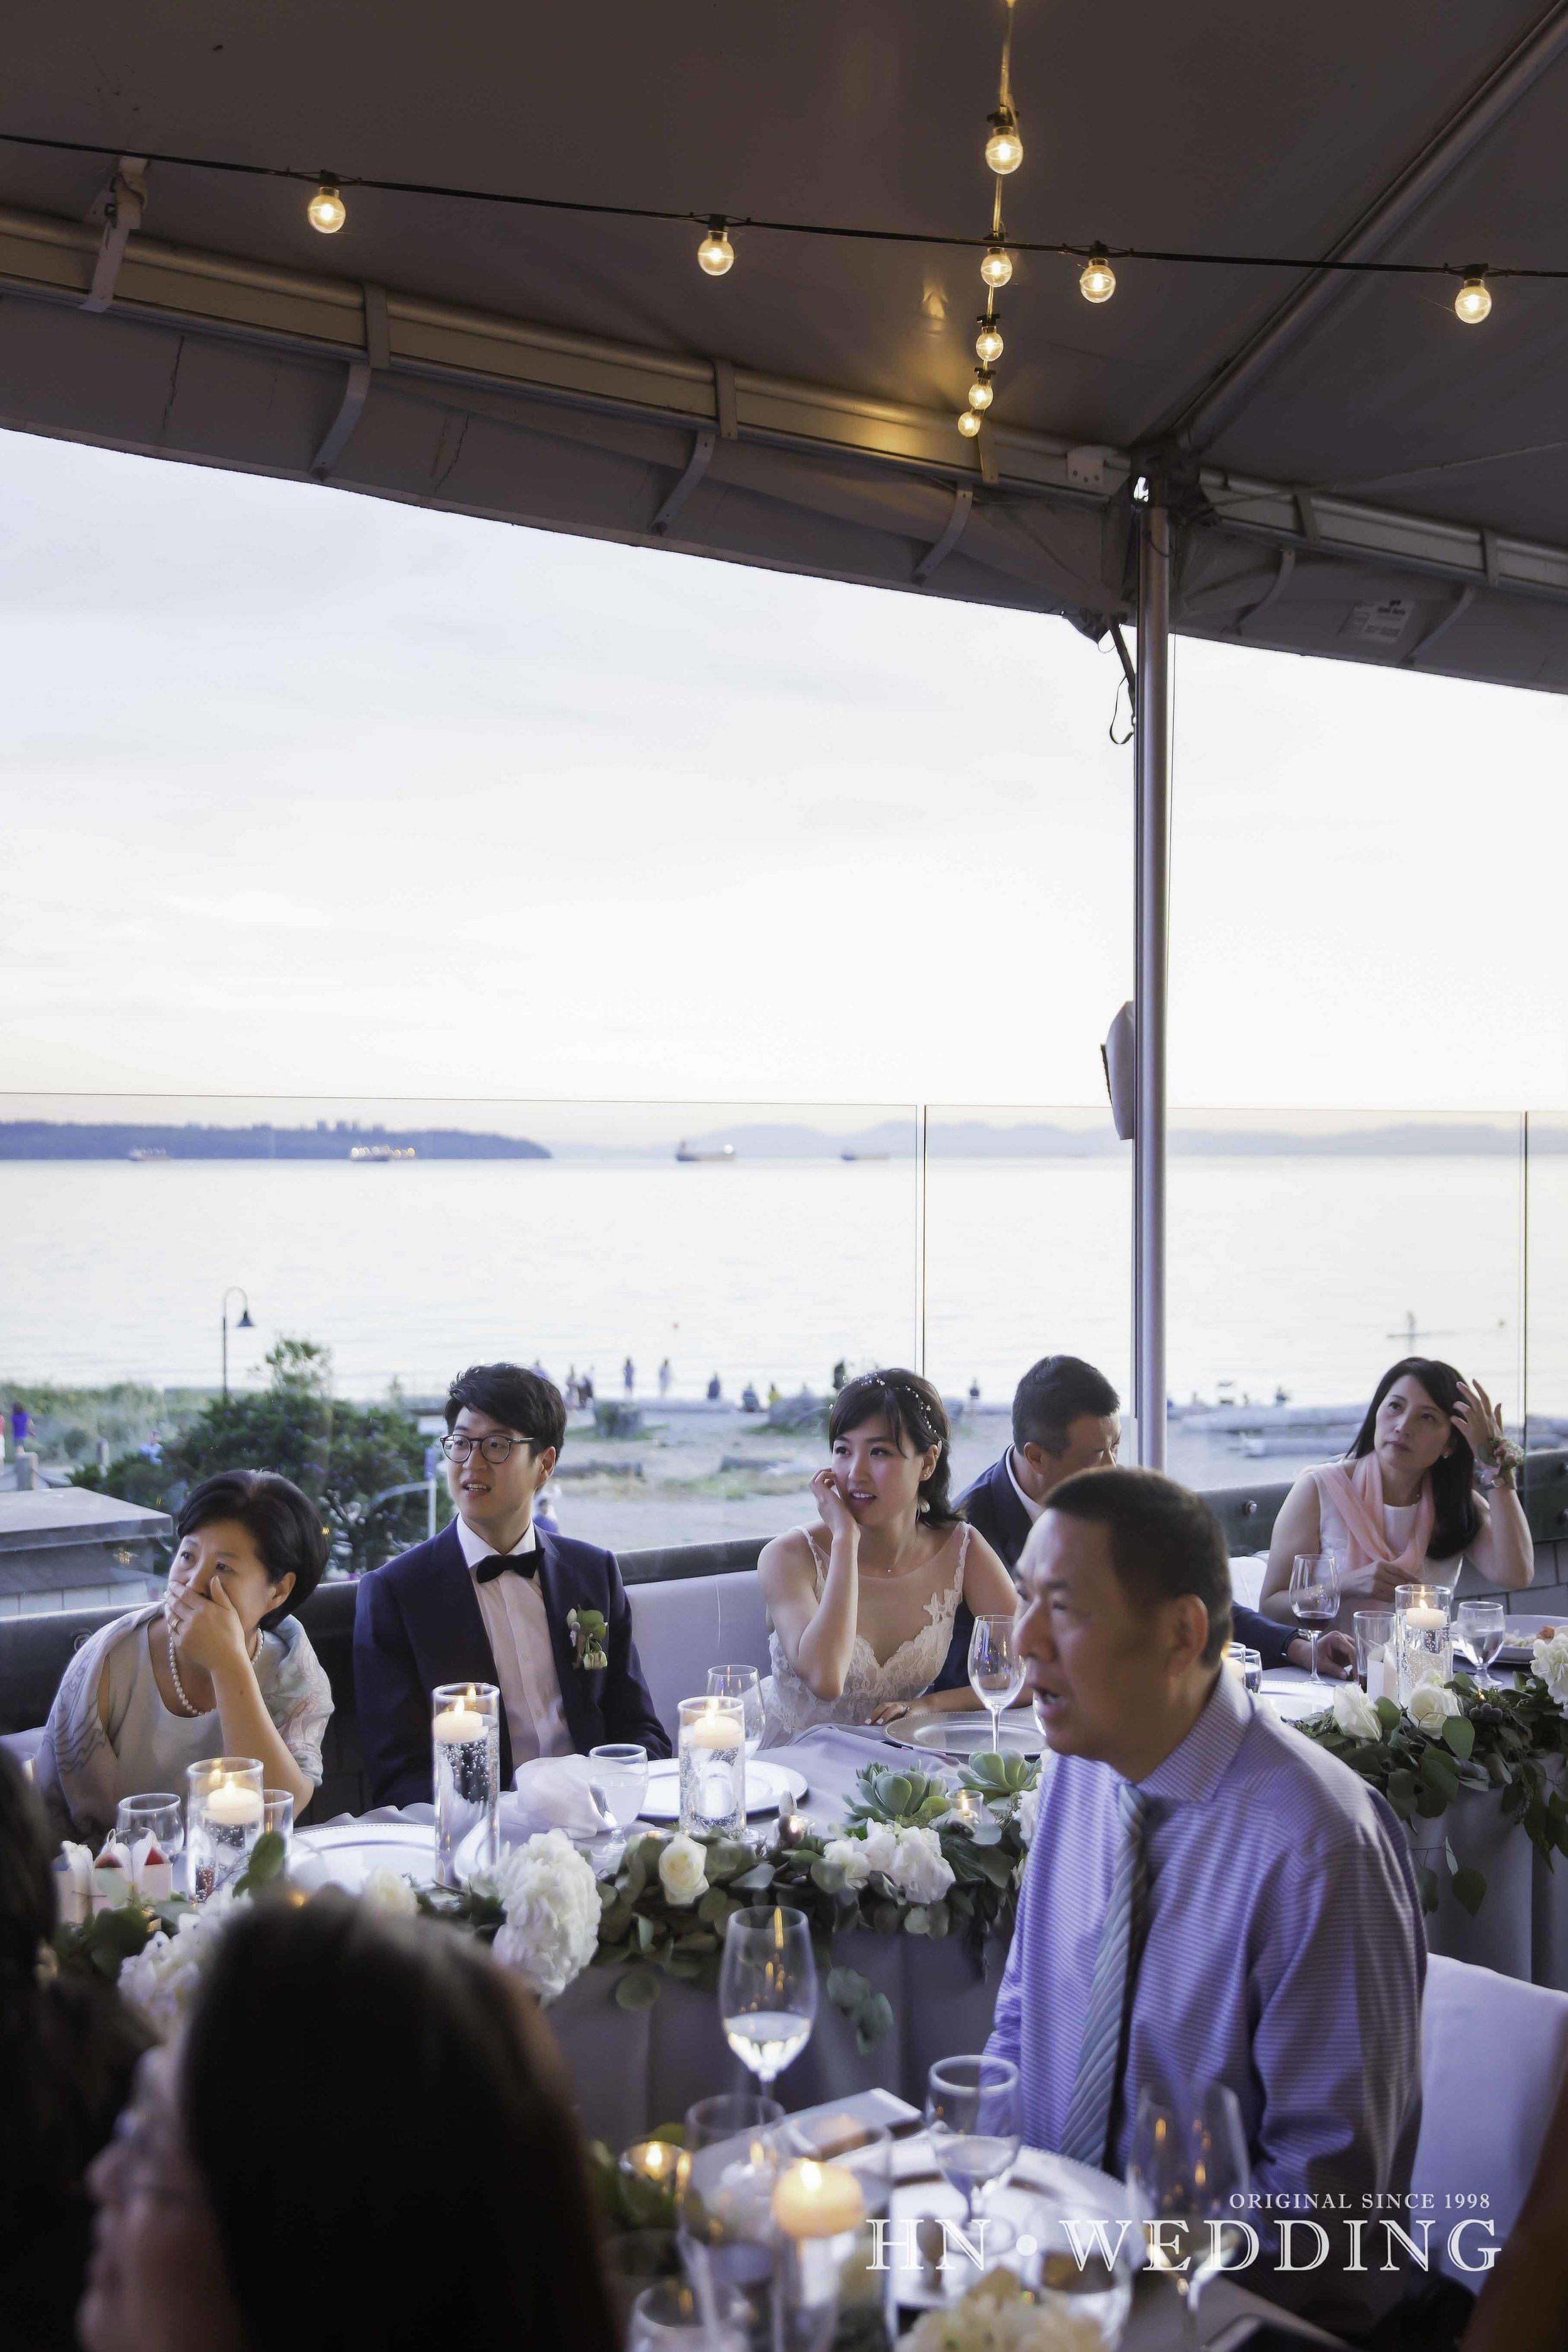 HNwedding-20160826-wedding-2318.jpg